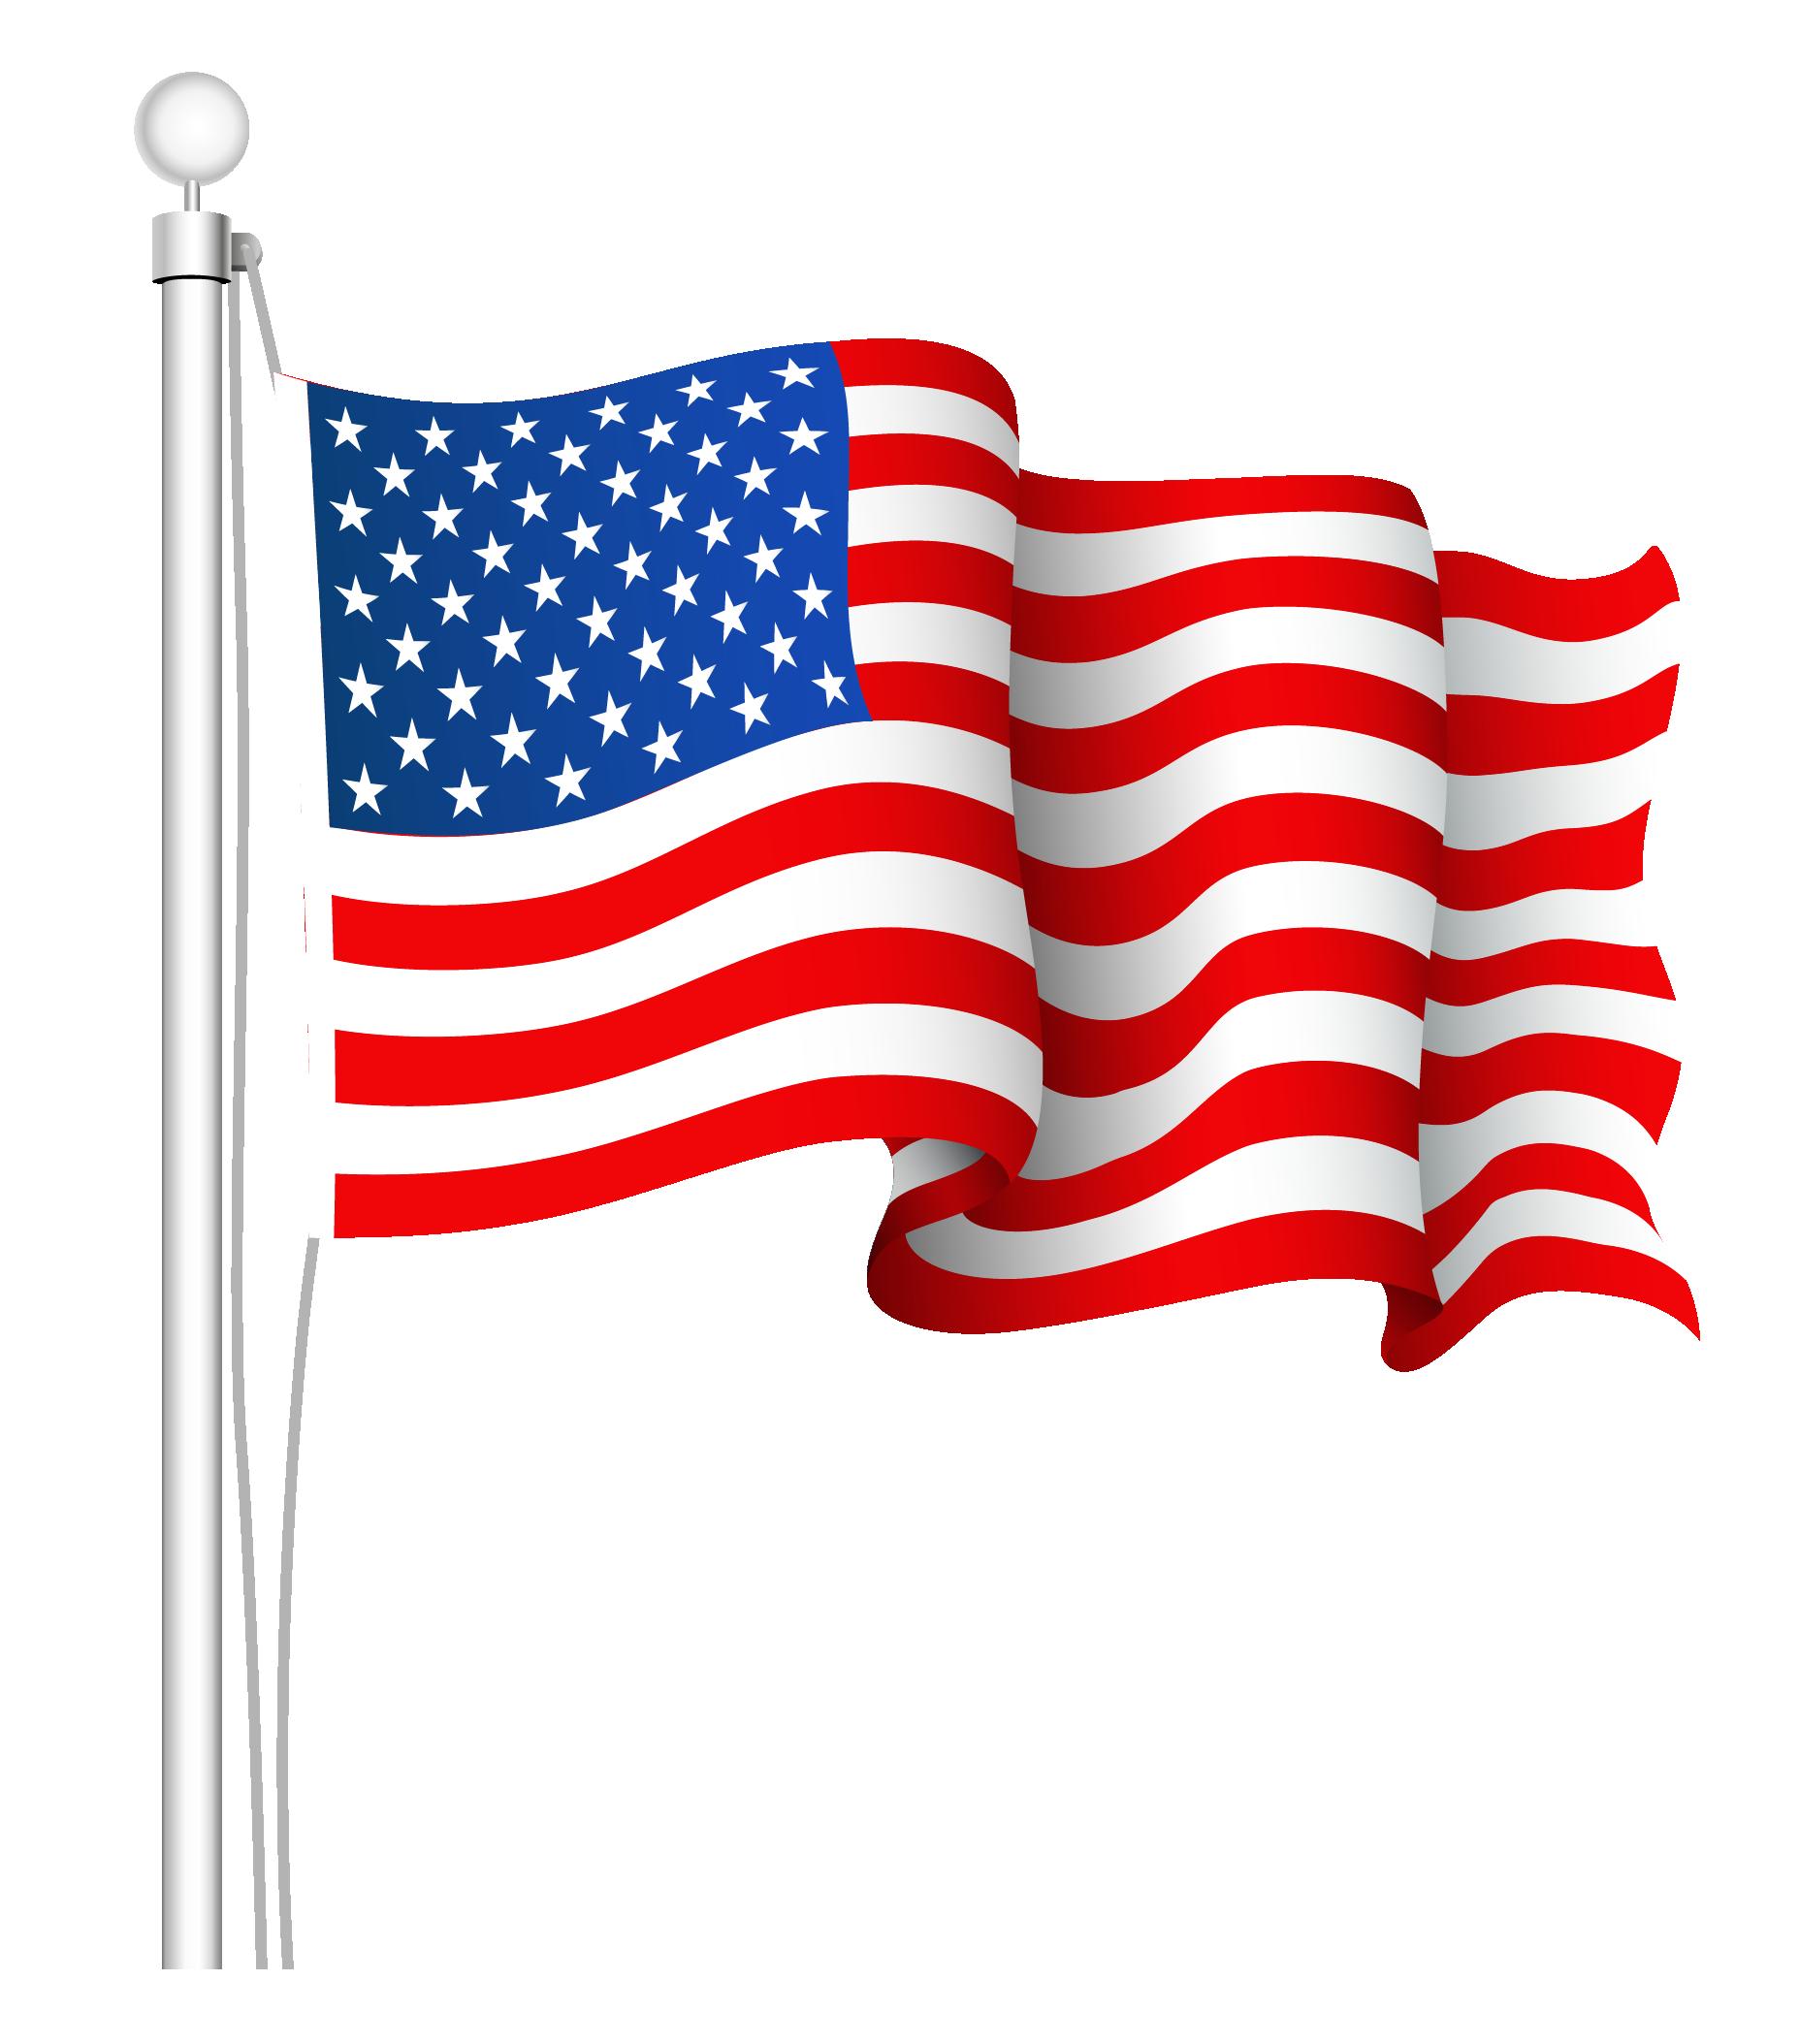 Clipartfest flag usa clipart. Clip art flags us